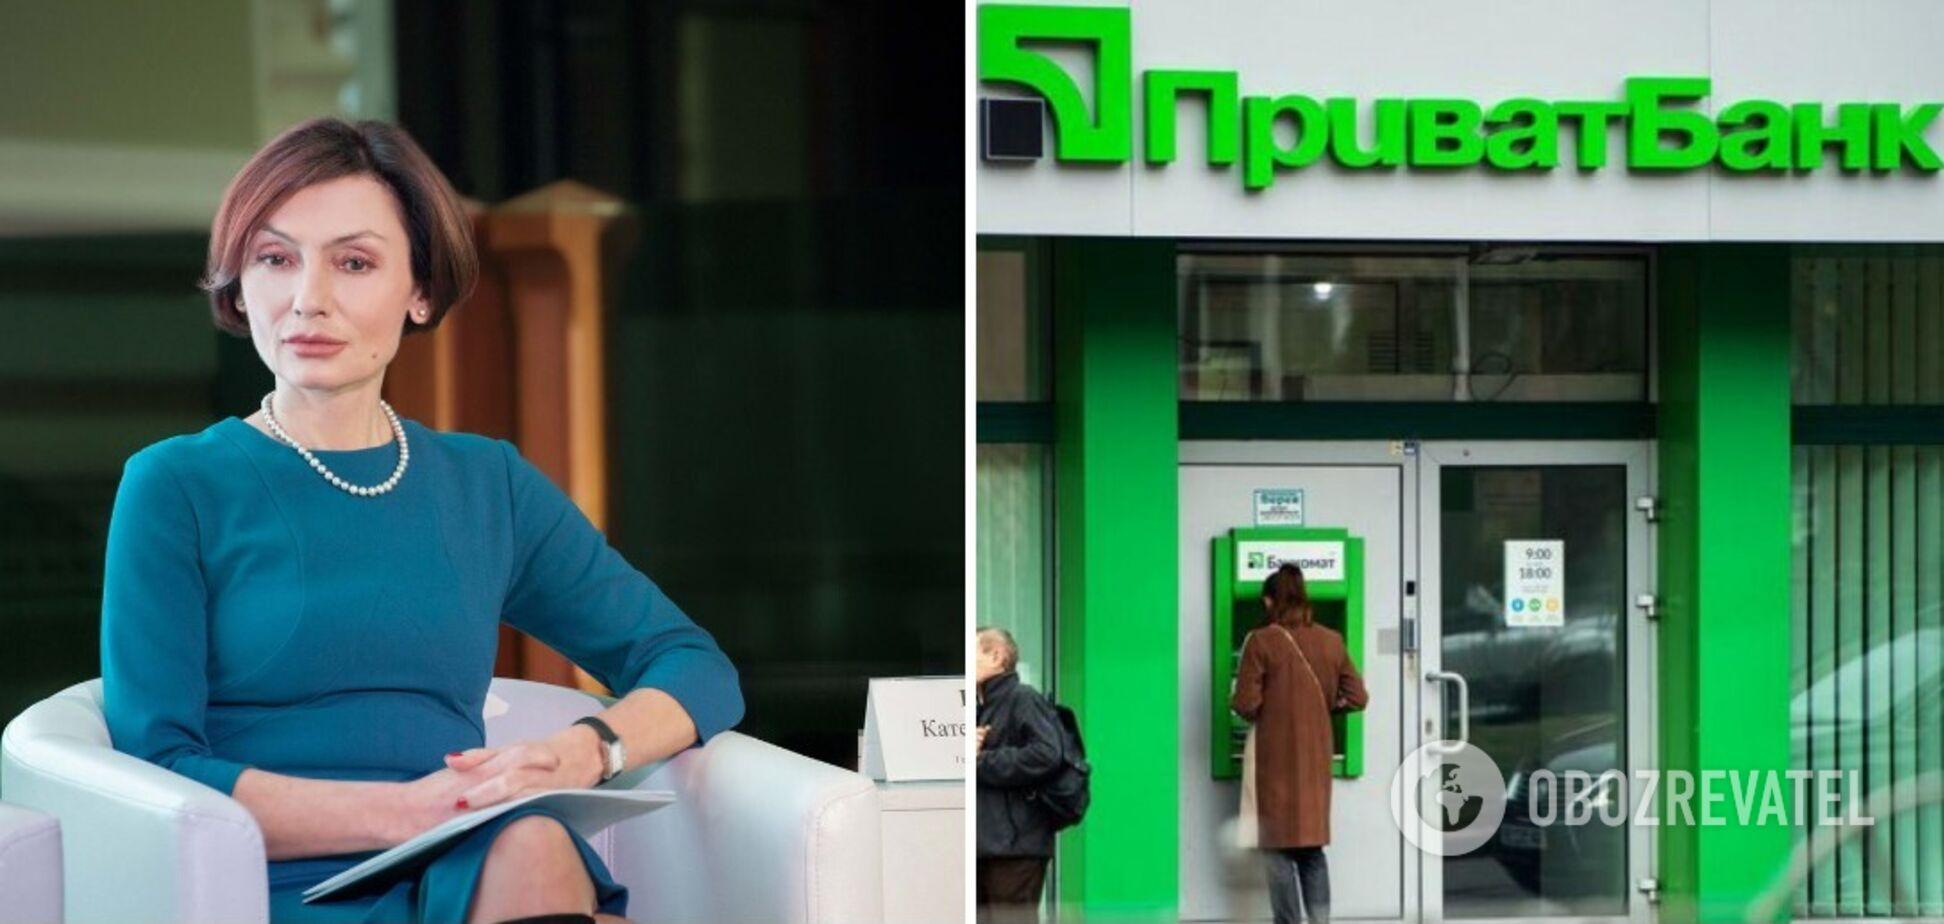 Рожкова на своїй посаді в Platinum bank робила те ж саме, що і топменеджери ПриватБанку